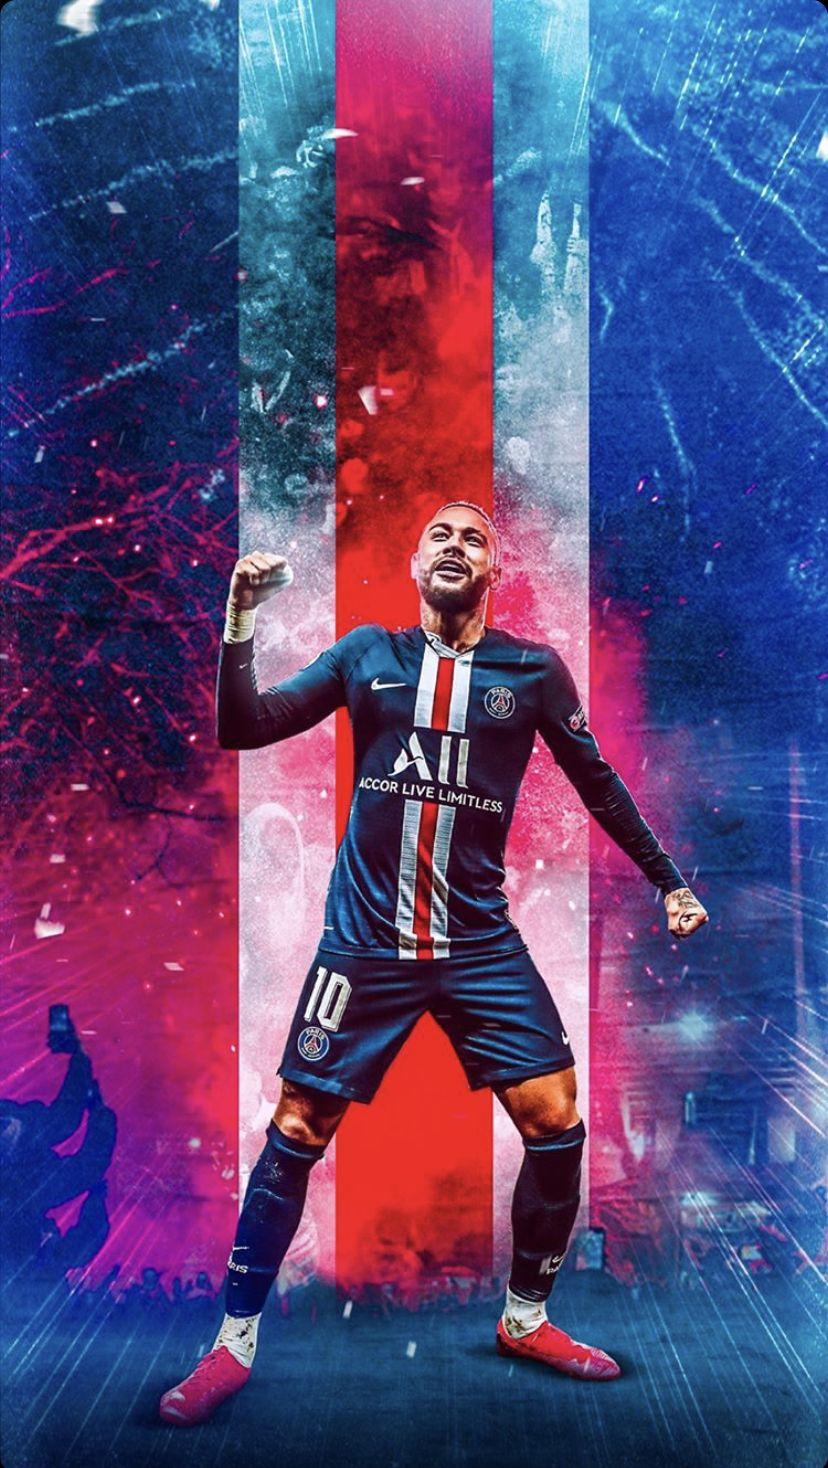 Neymar Fd En 2020 Images De Football Photos De Football Fond D Ecran Psg